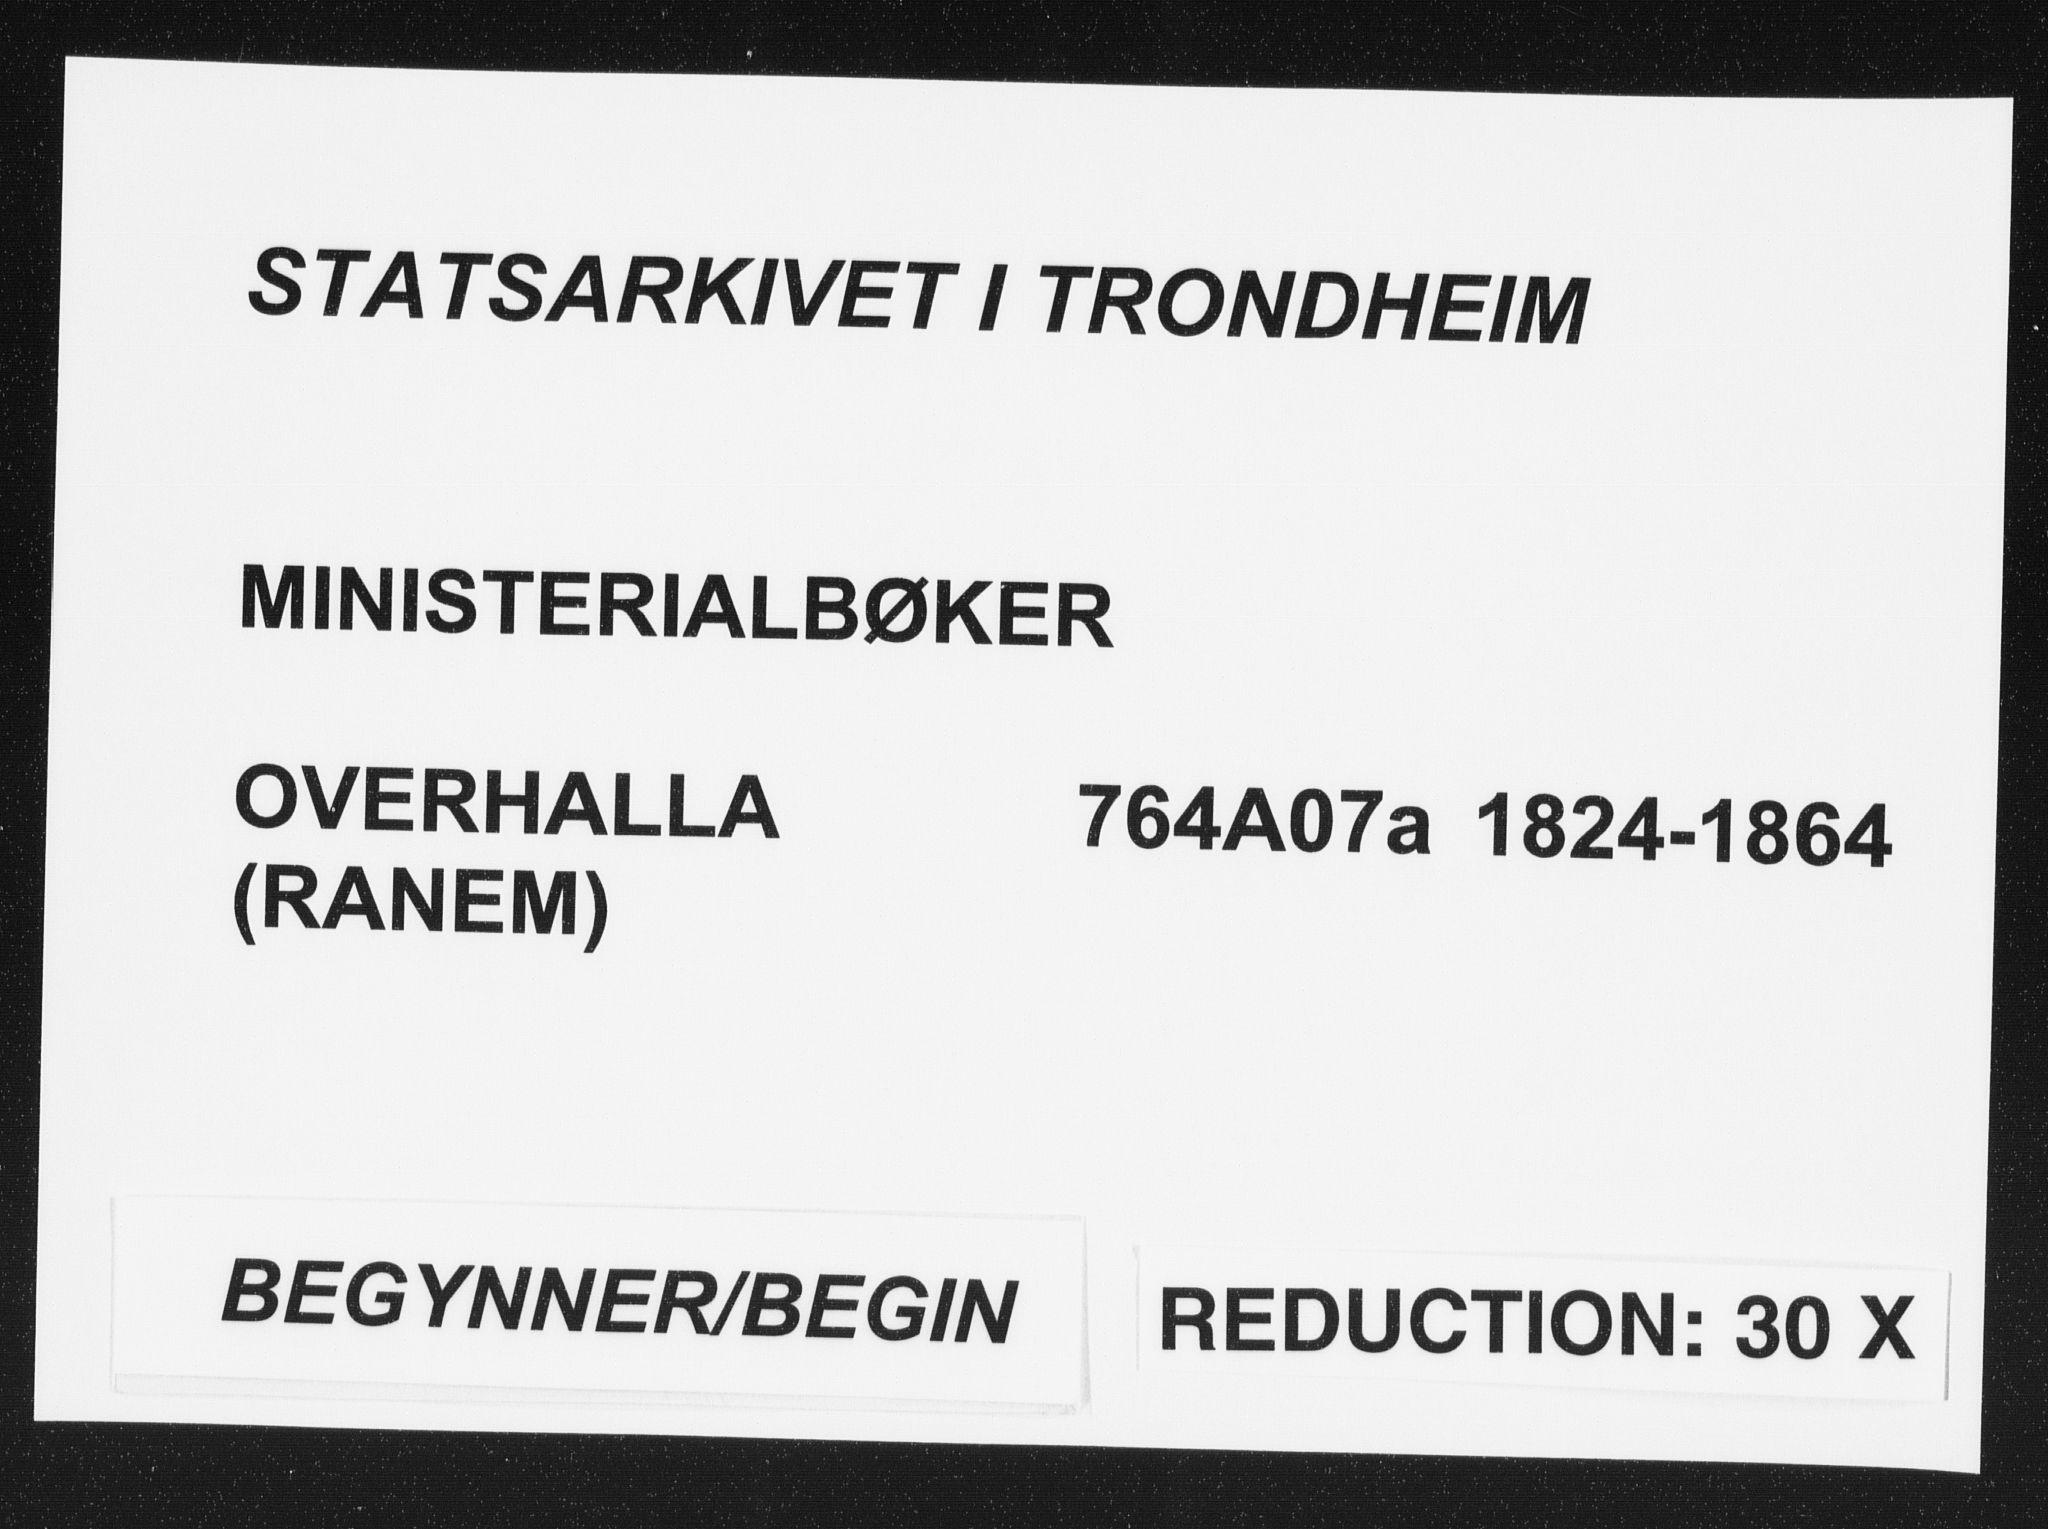 SAT, Ministerialprotokoller, klokkerbøker og fødselsregistre - Nord-Trøndelag, 764/L0551: Ministerialbok nr. 764A07a, 1824-1864